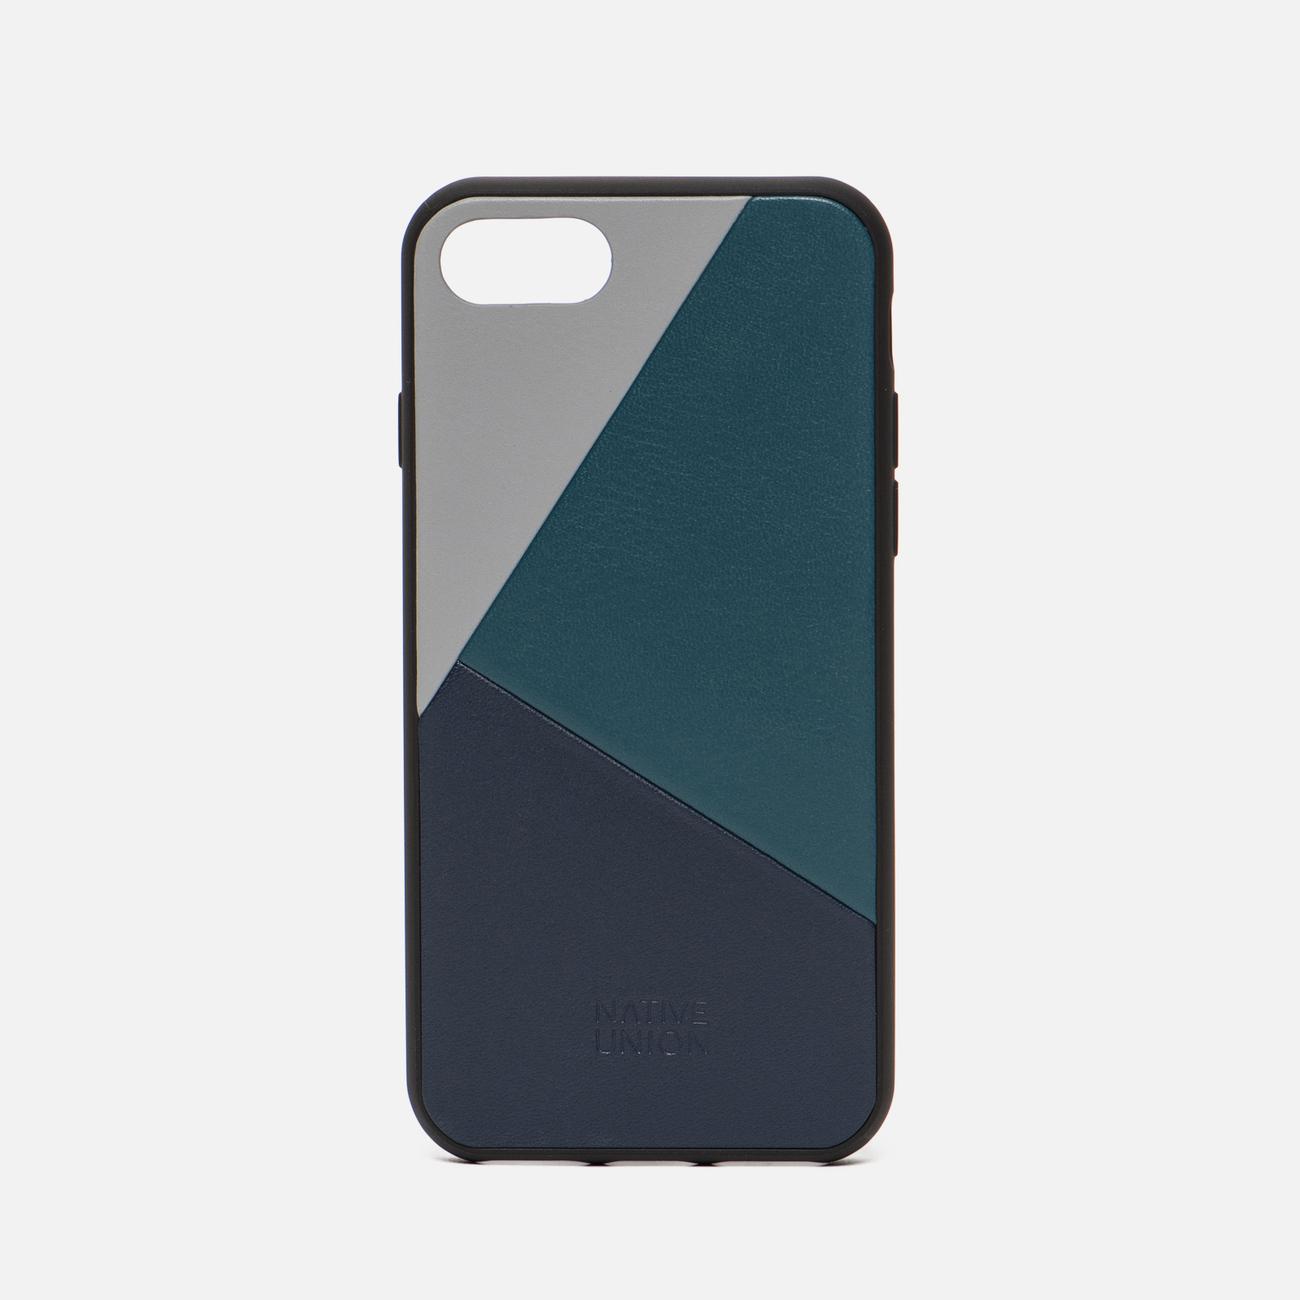 Чехол Native Union Clic Marquetry iPhone 7/8 Grey/Dark Green/Dark Blue